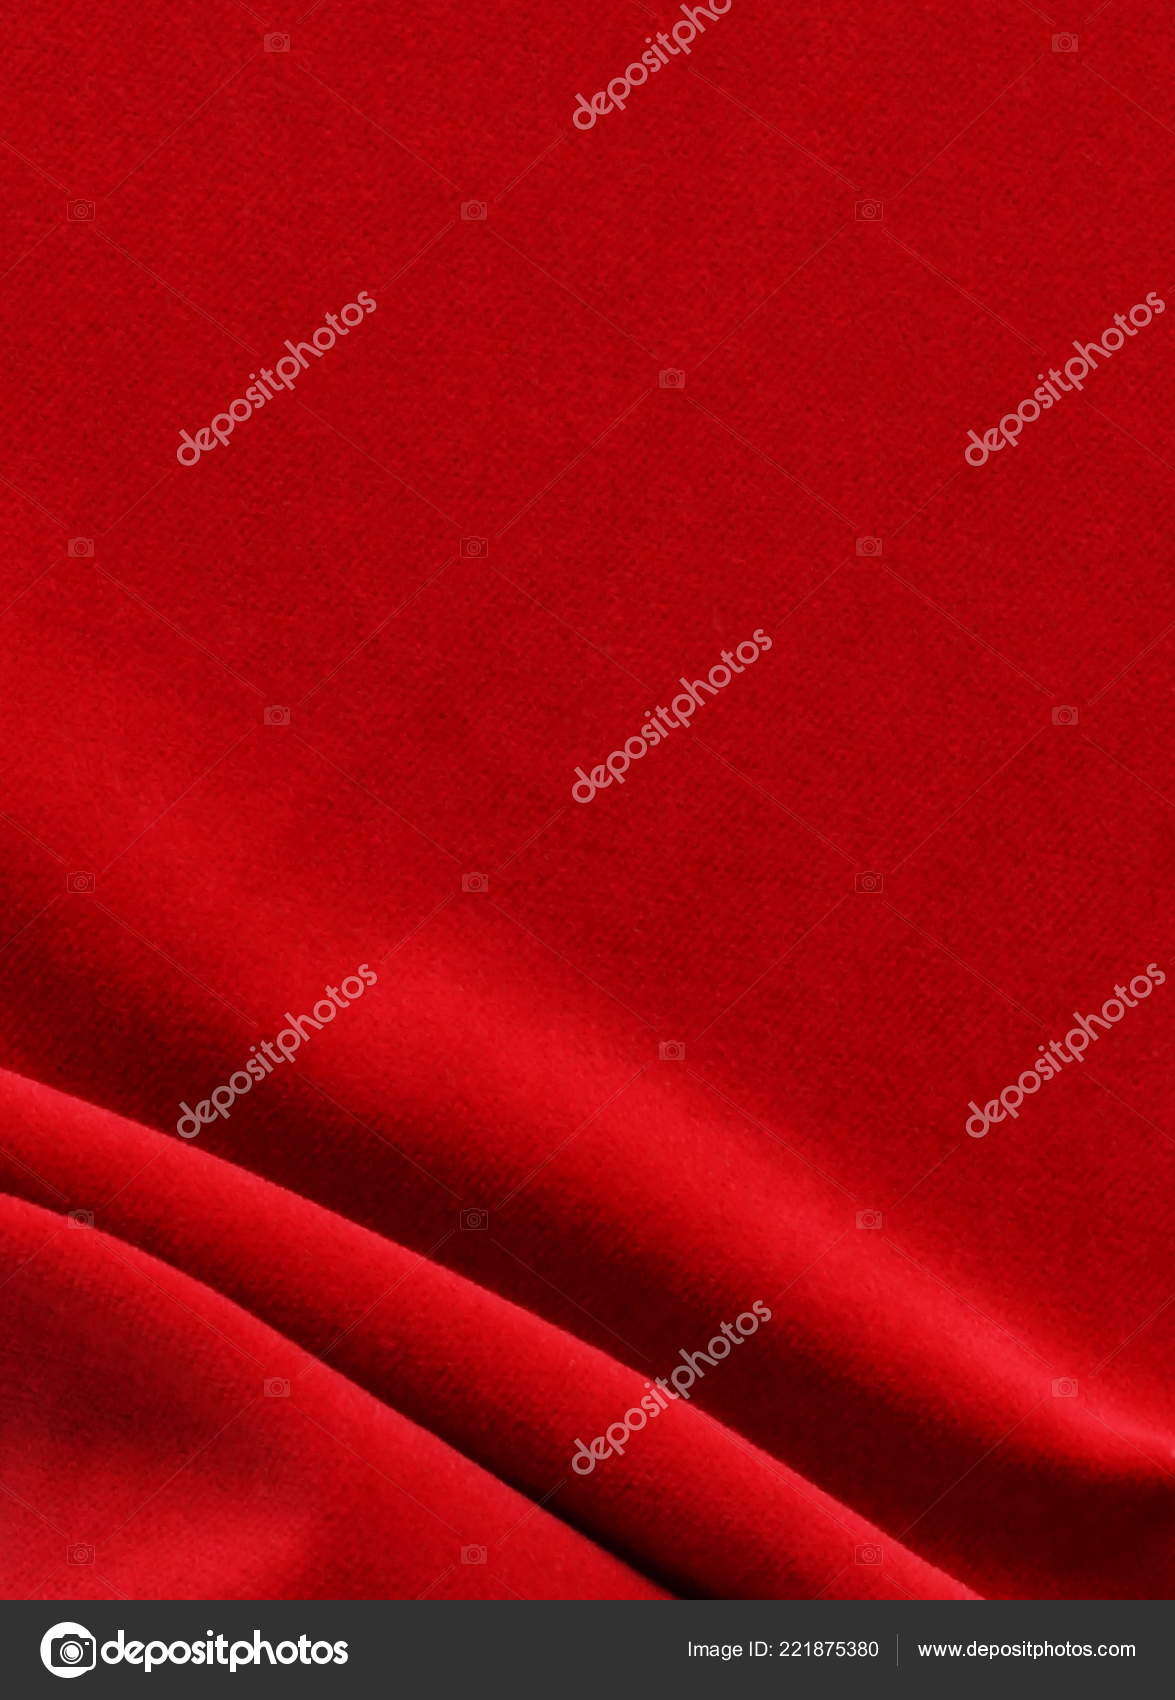 Red Velvet Texture Background Christmas Festive Baskground Expensive